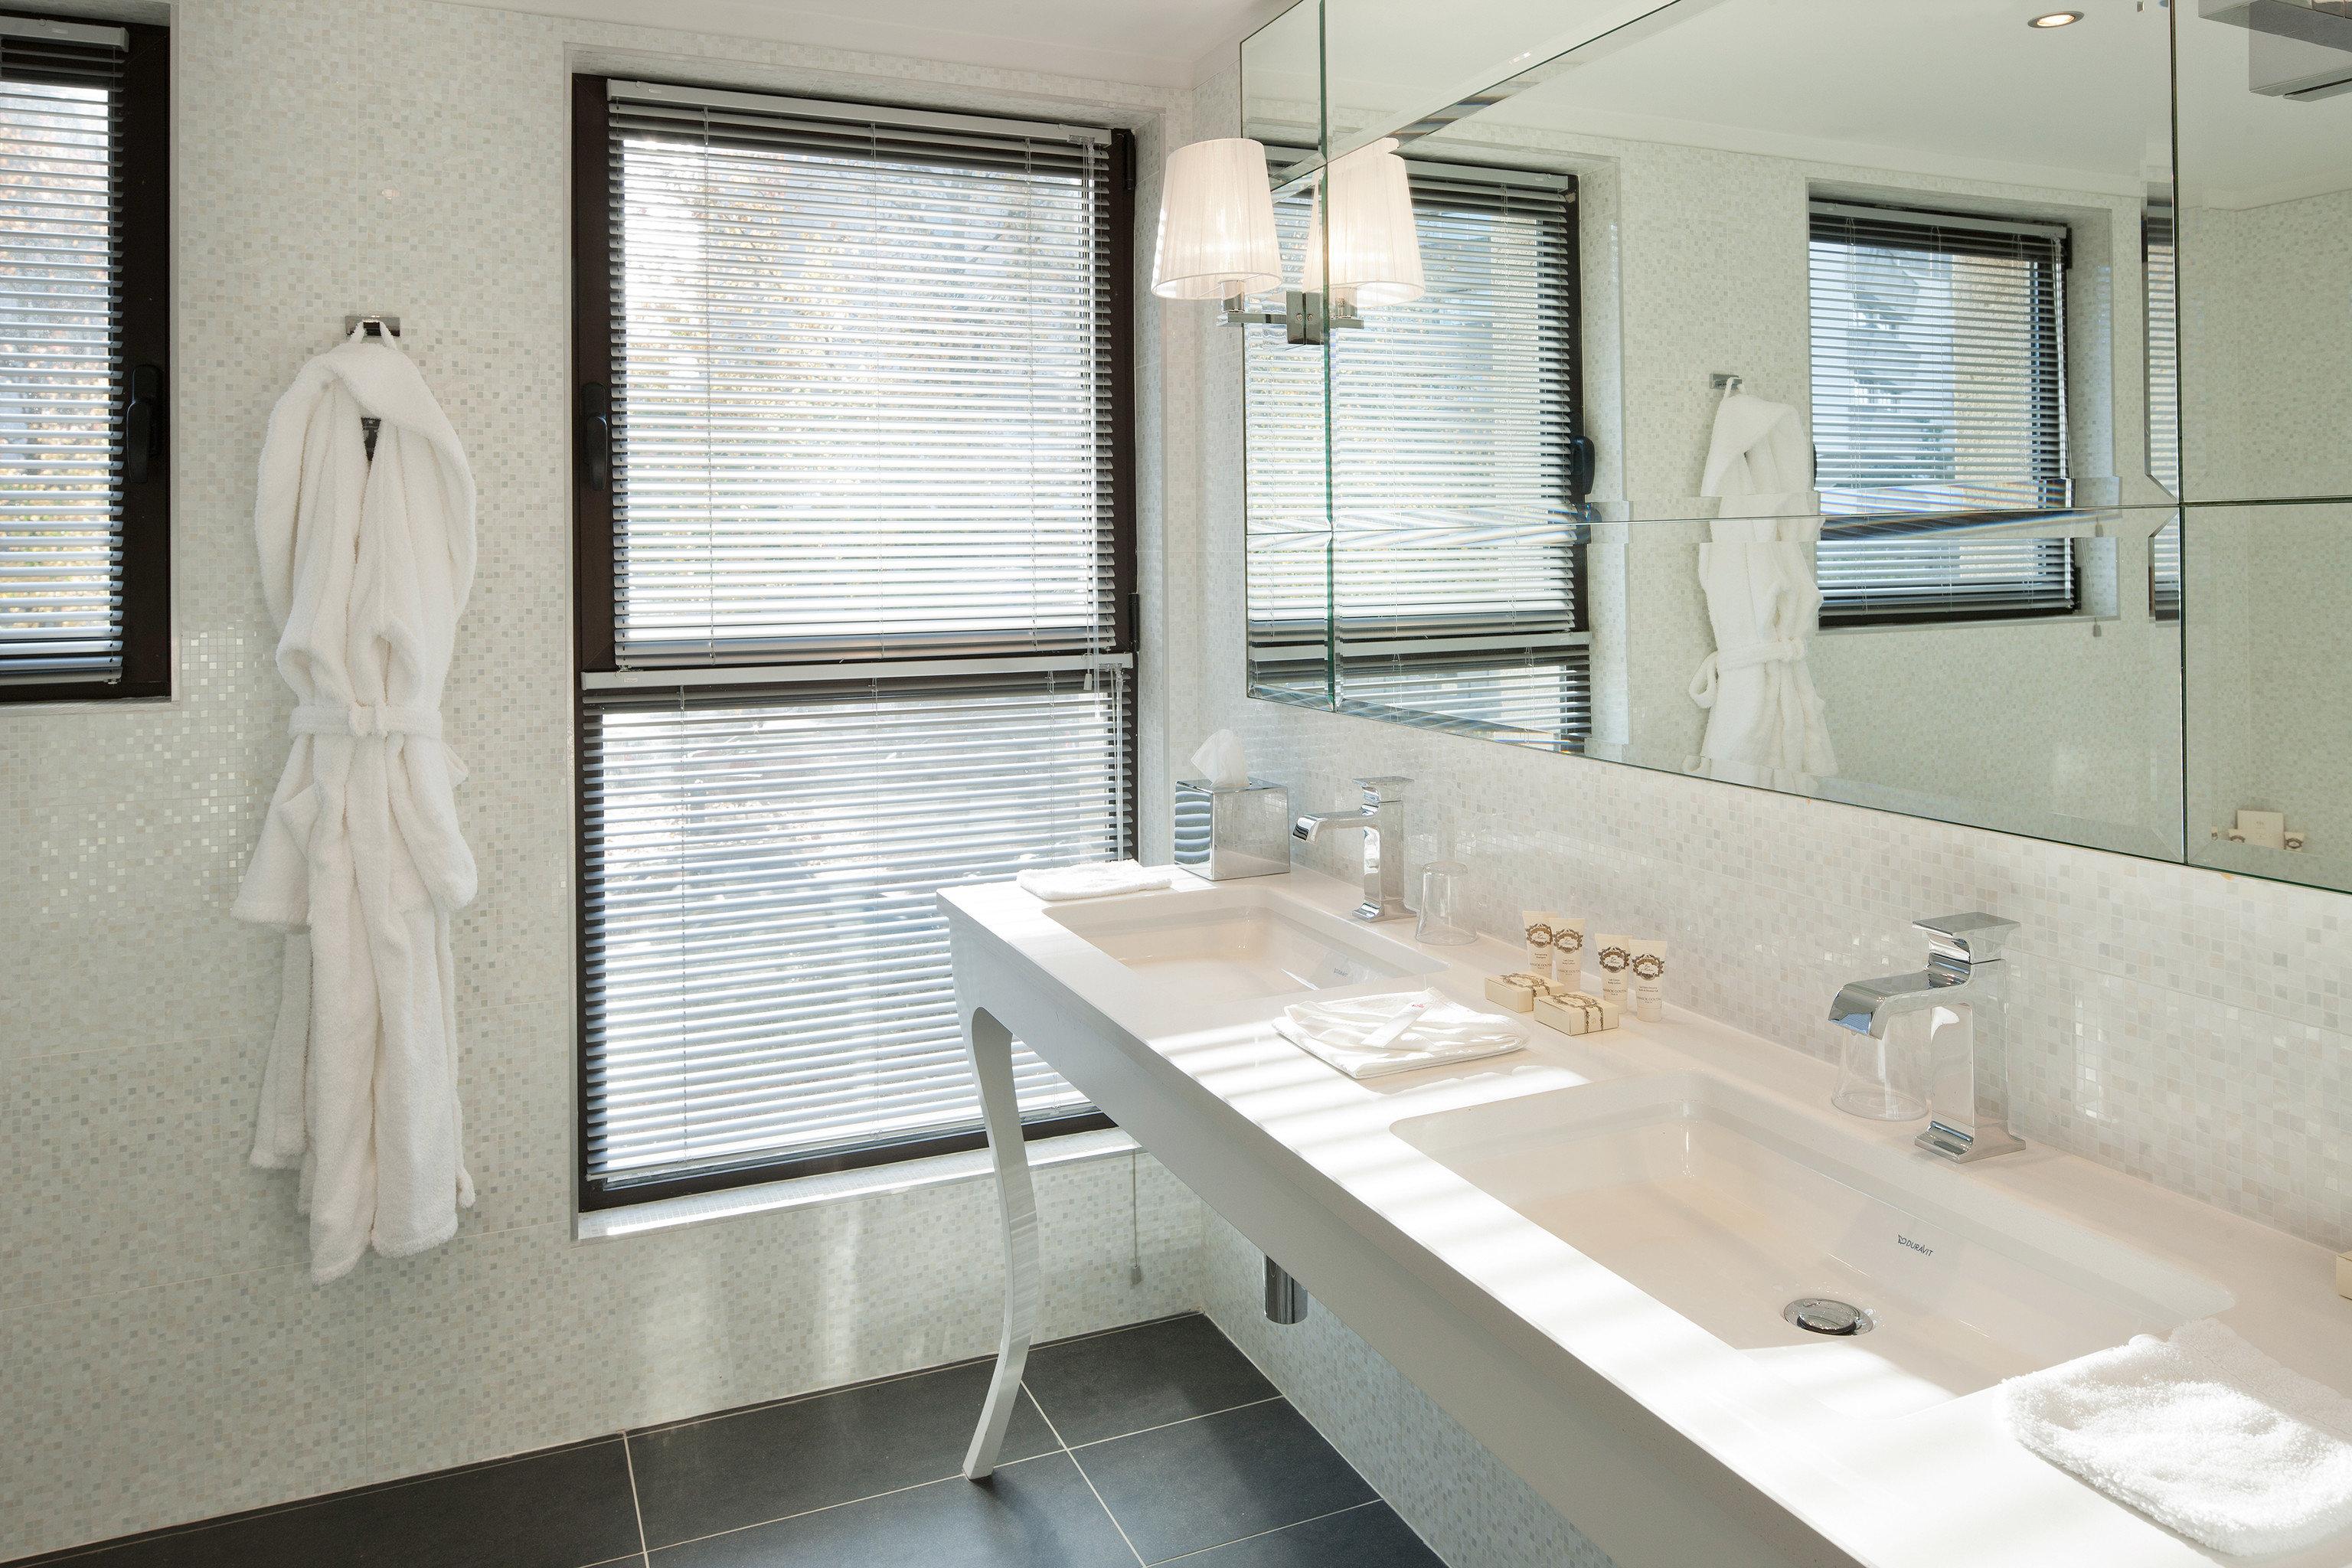 Bath Modern Resort bathroom sink mirror property home white swimming pool toilet tub tile tiled bathtub